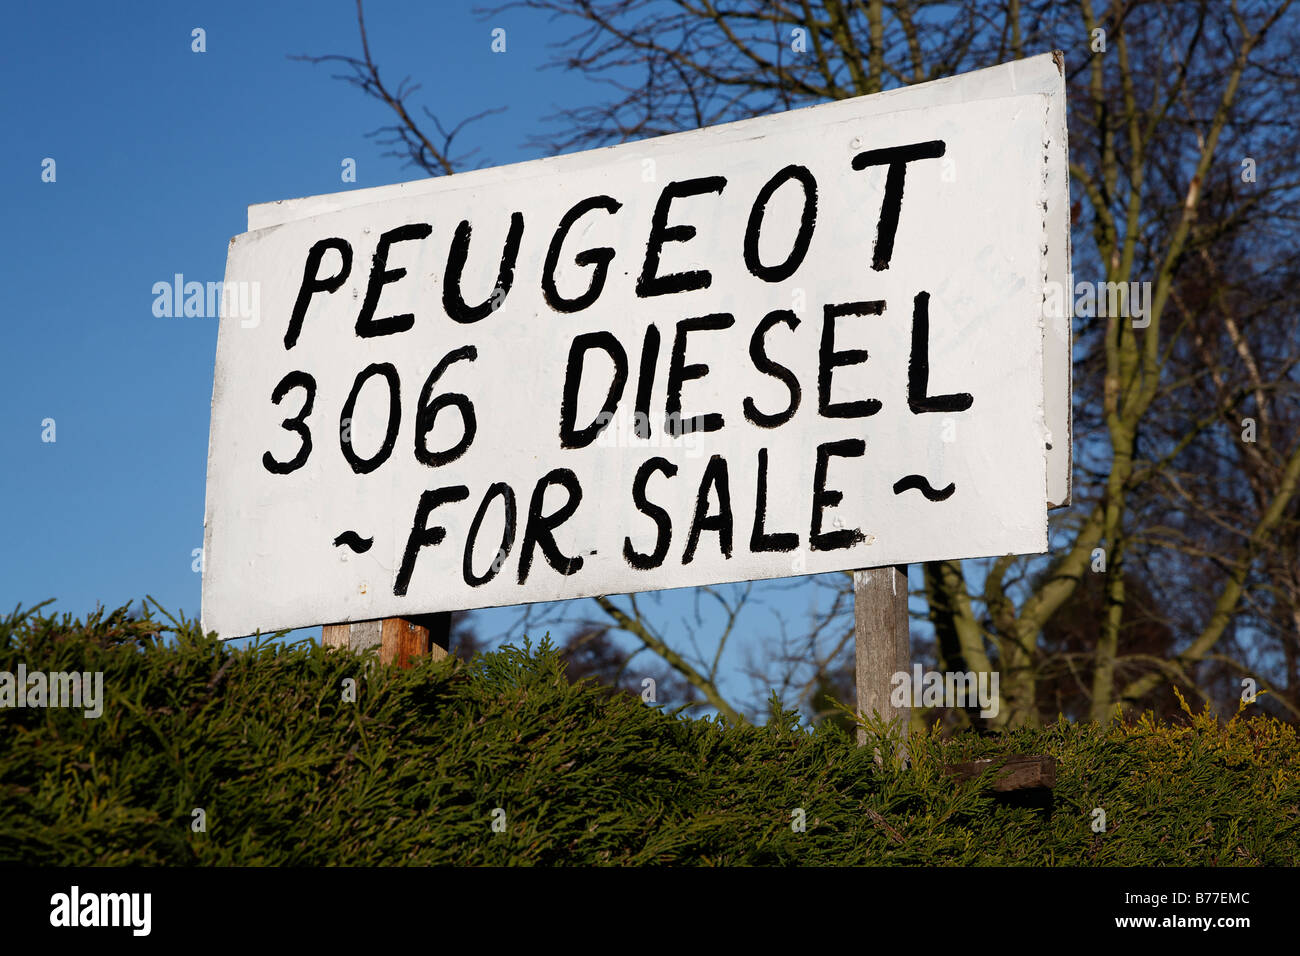 Homemade sign for Peugeot 306 diesel for sale - Stock Image